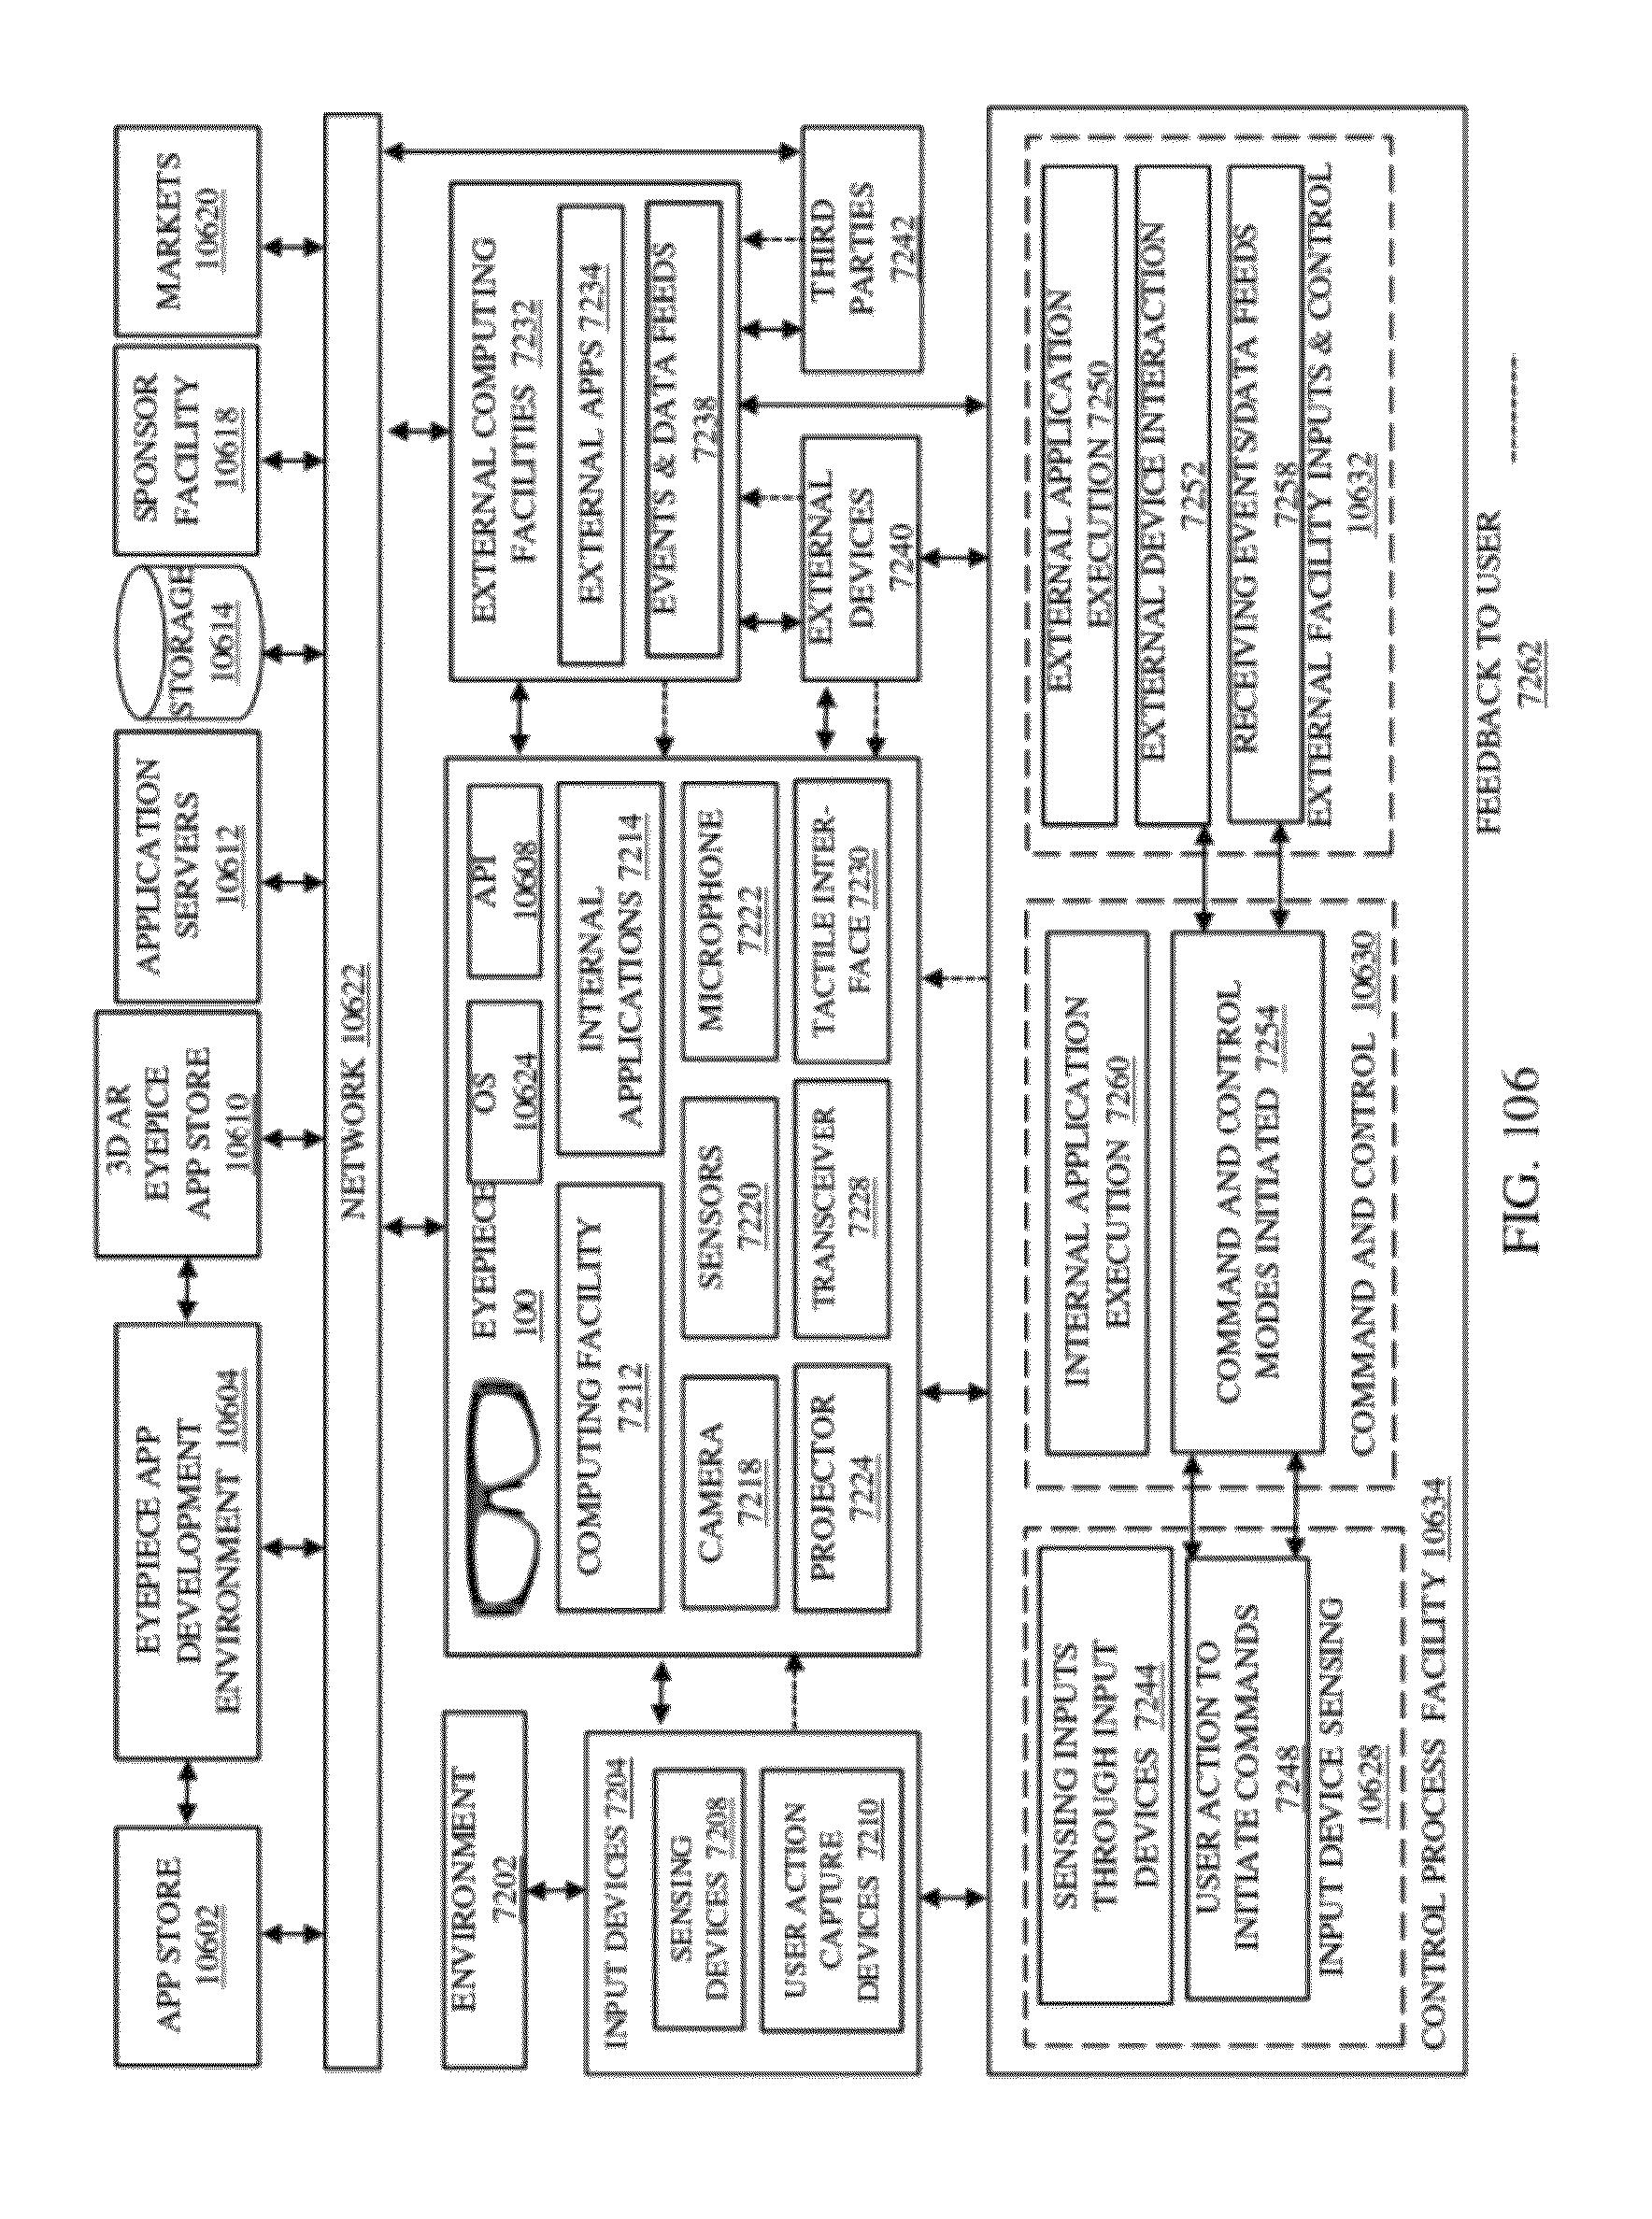 Patent US 9,366,862 B2